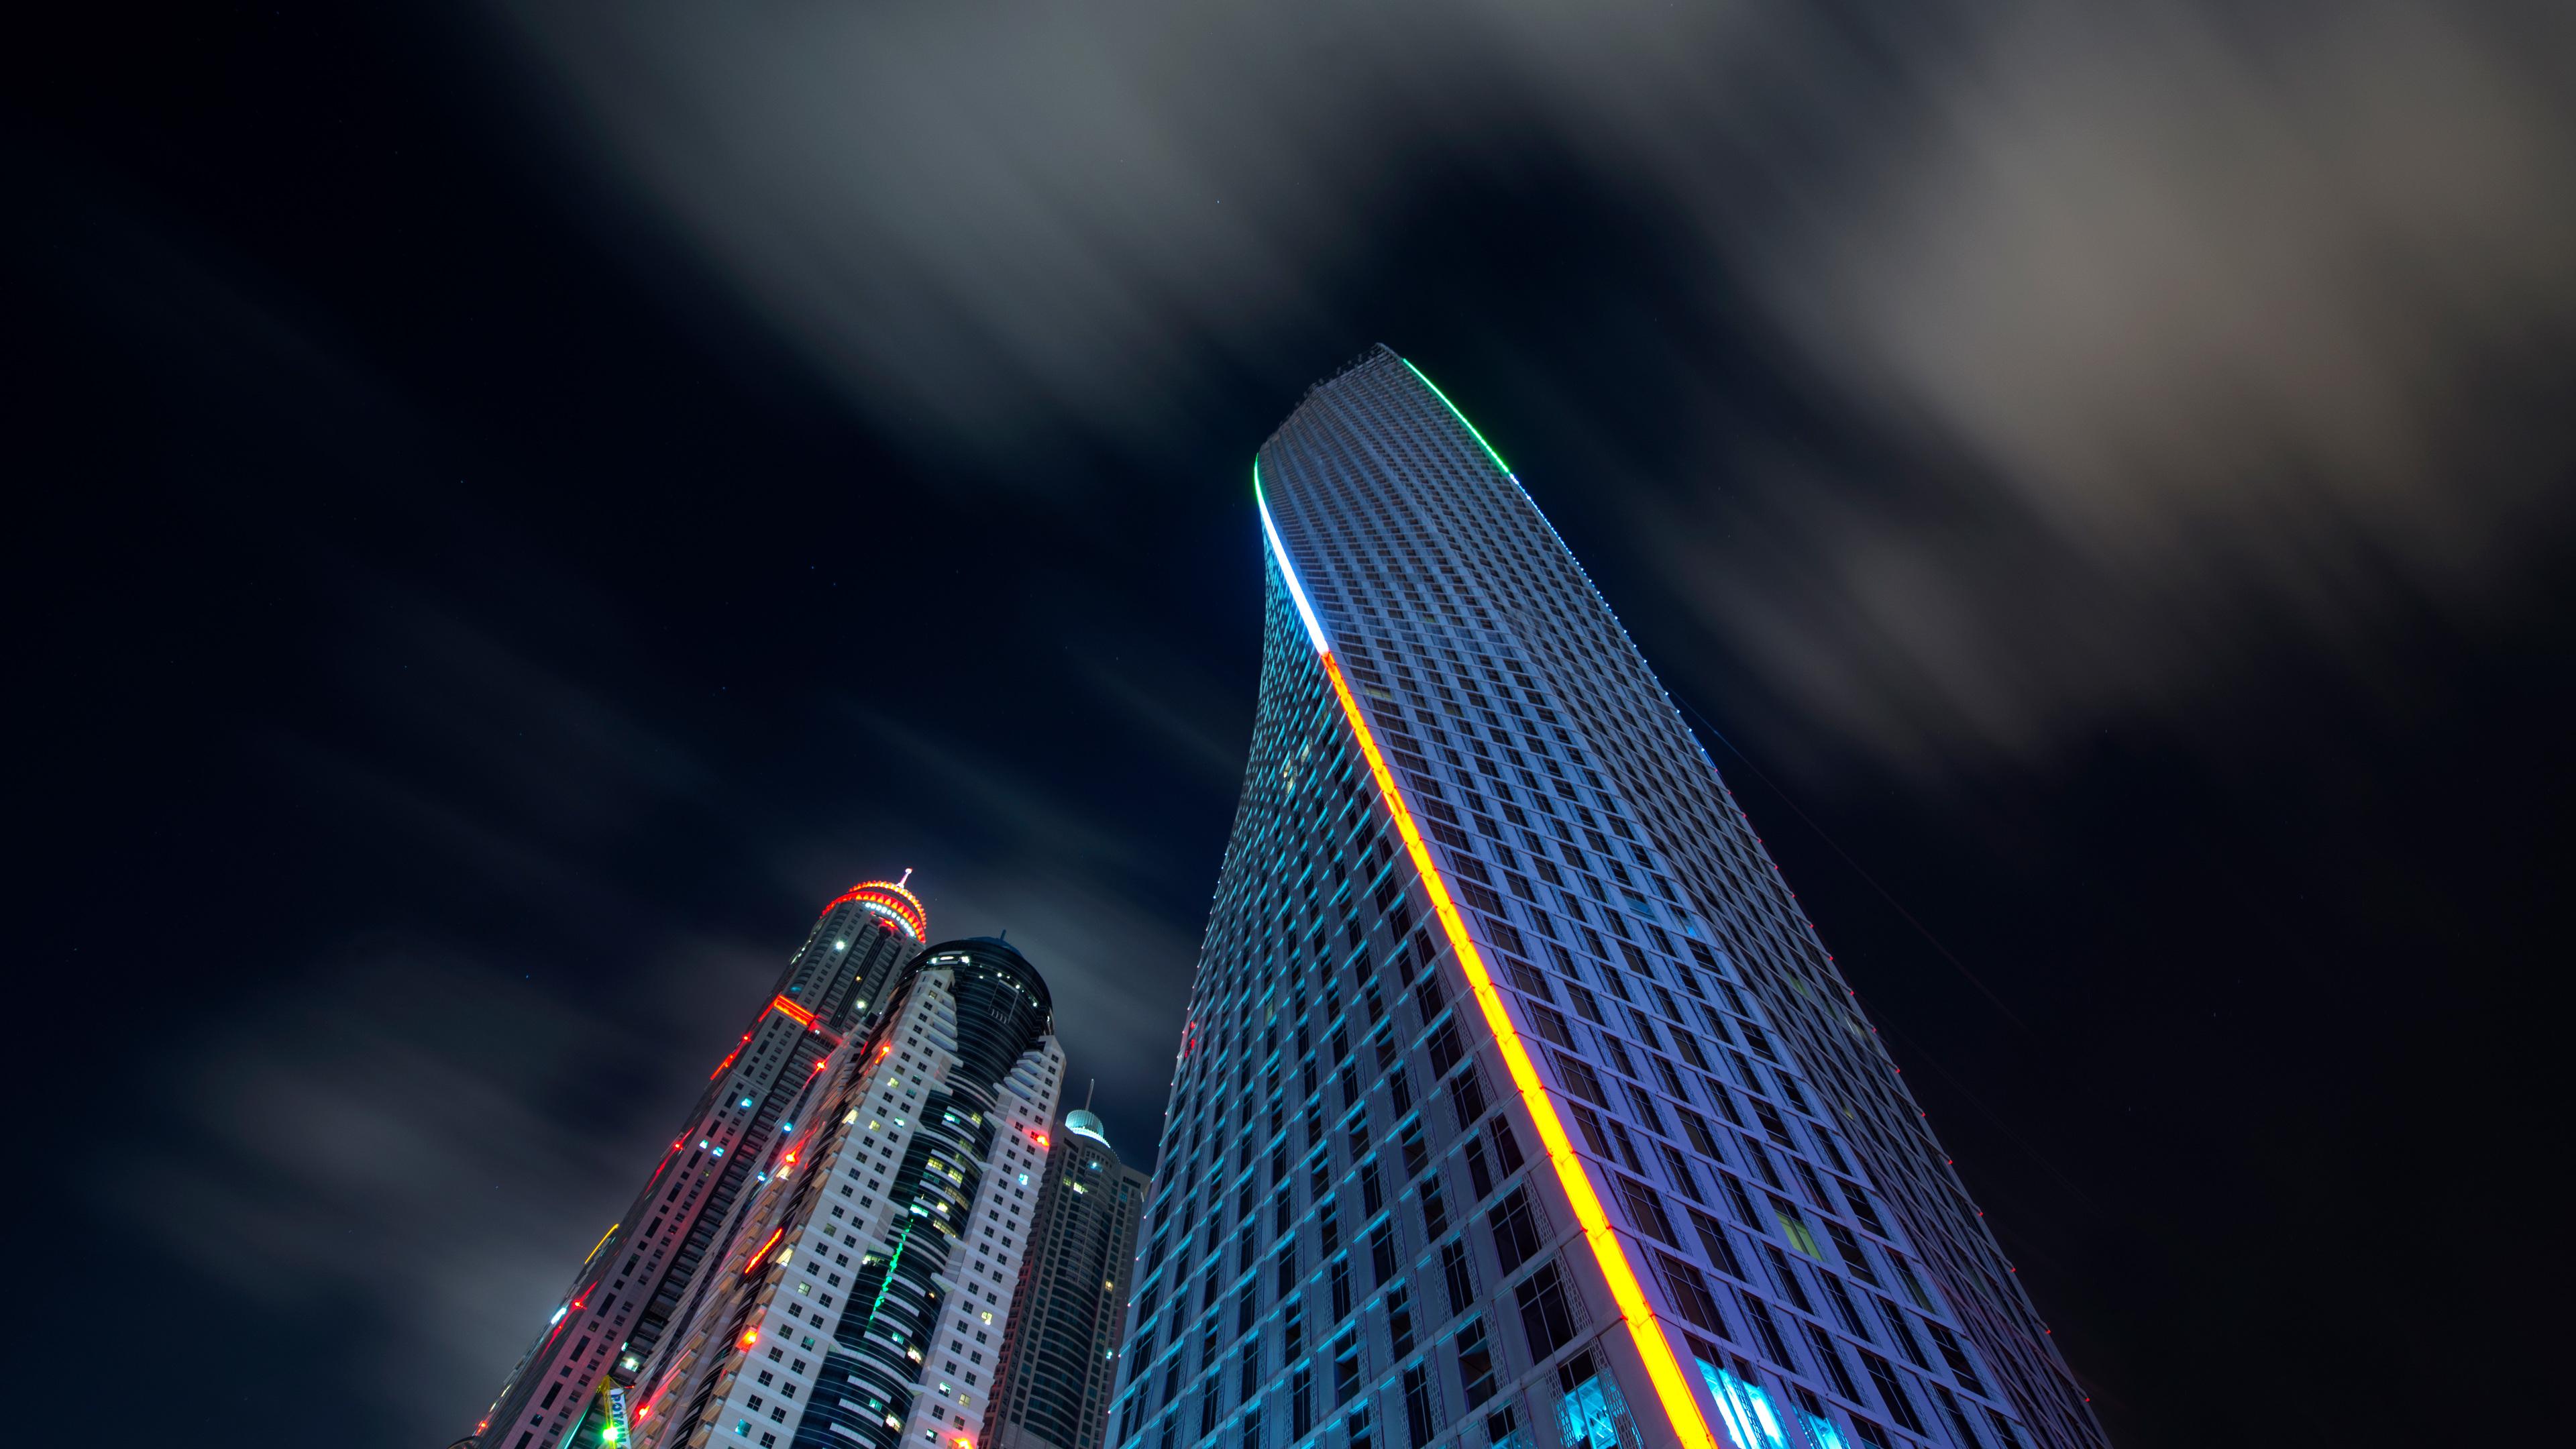 buildings skyscraper dubai nights 8k 1538070304 - Buildings Skyscraper Dubai Nights 8k - world wallpapers, skycrapper wallpapers, night wallpapers, hd-wallpapers, dubai wallpapers, buildings wallpapers, 8k wallpapers, 5k wallpapers, 4k-wallpapers